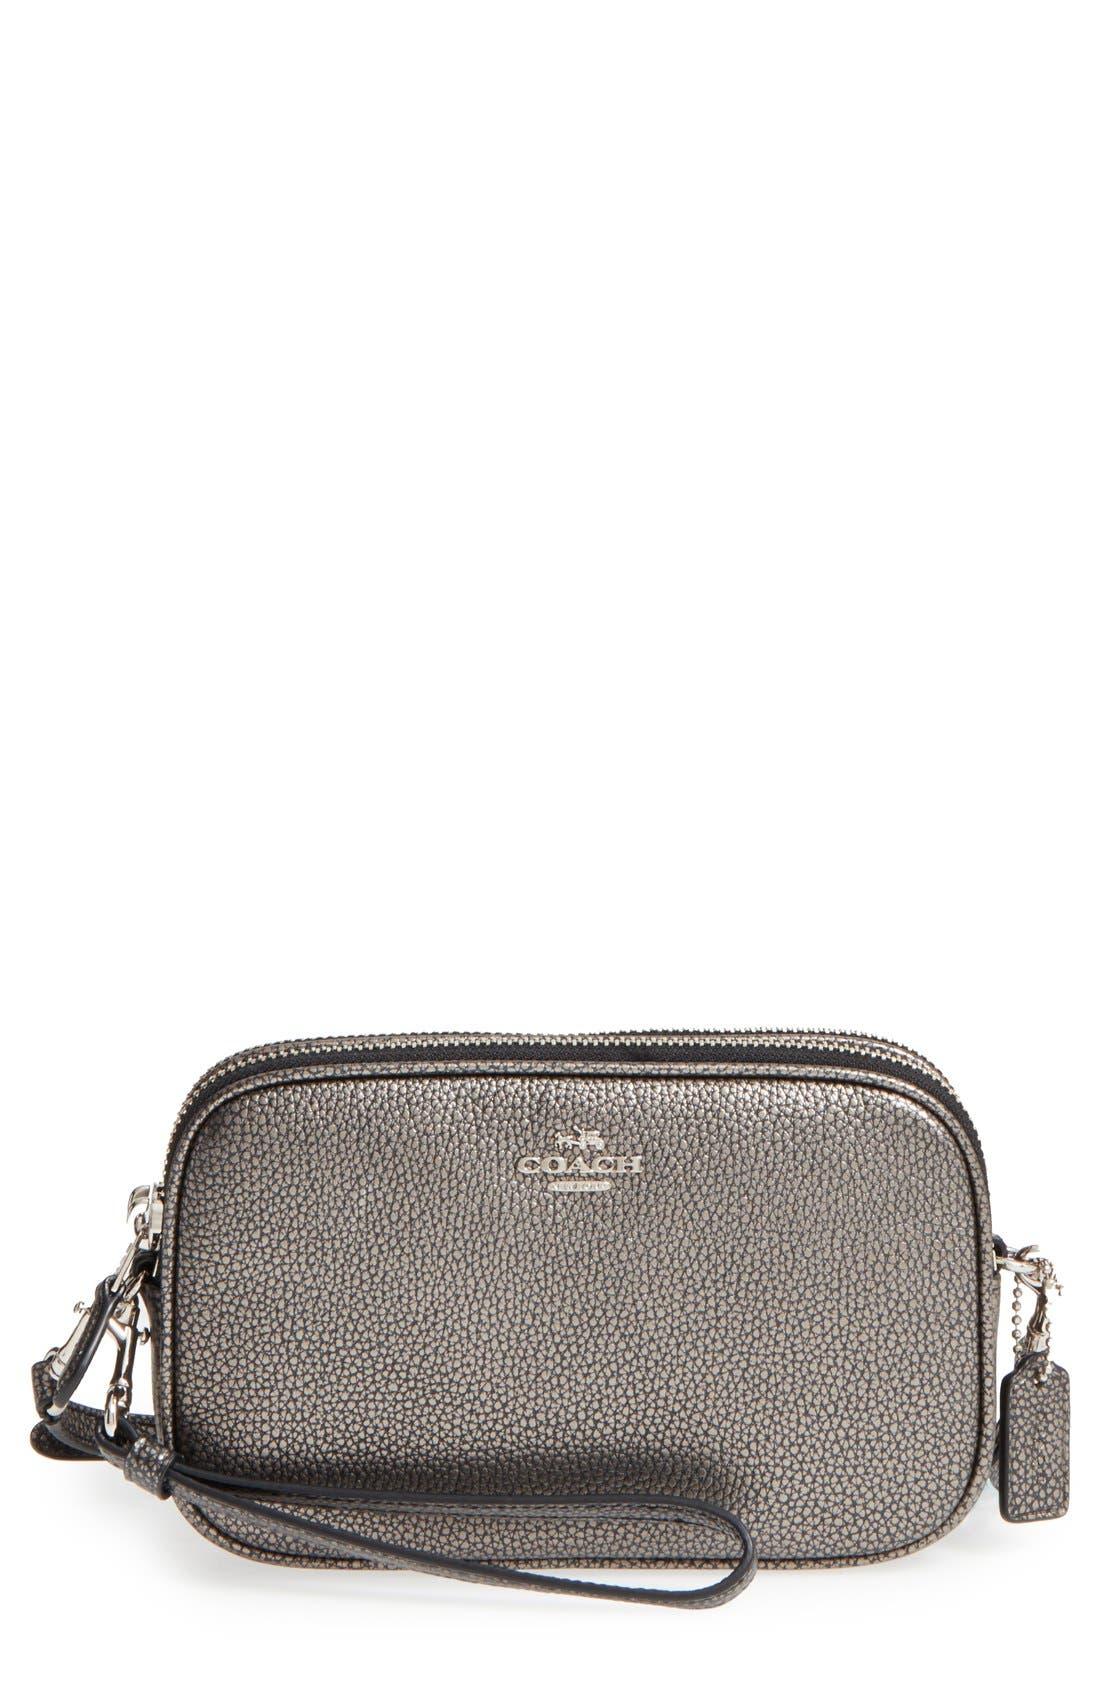 Convertible Leather Crossbody Bag,                             Main thumbnail 1, color,                             Gunmetal/ Silver